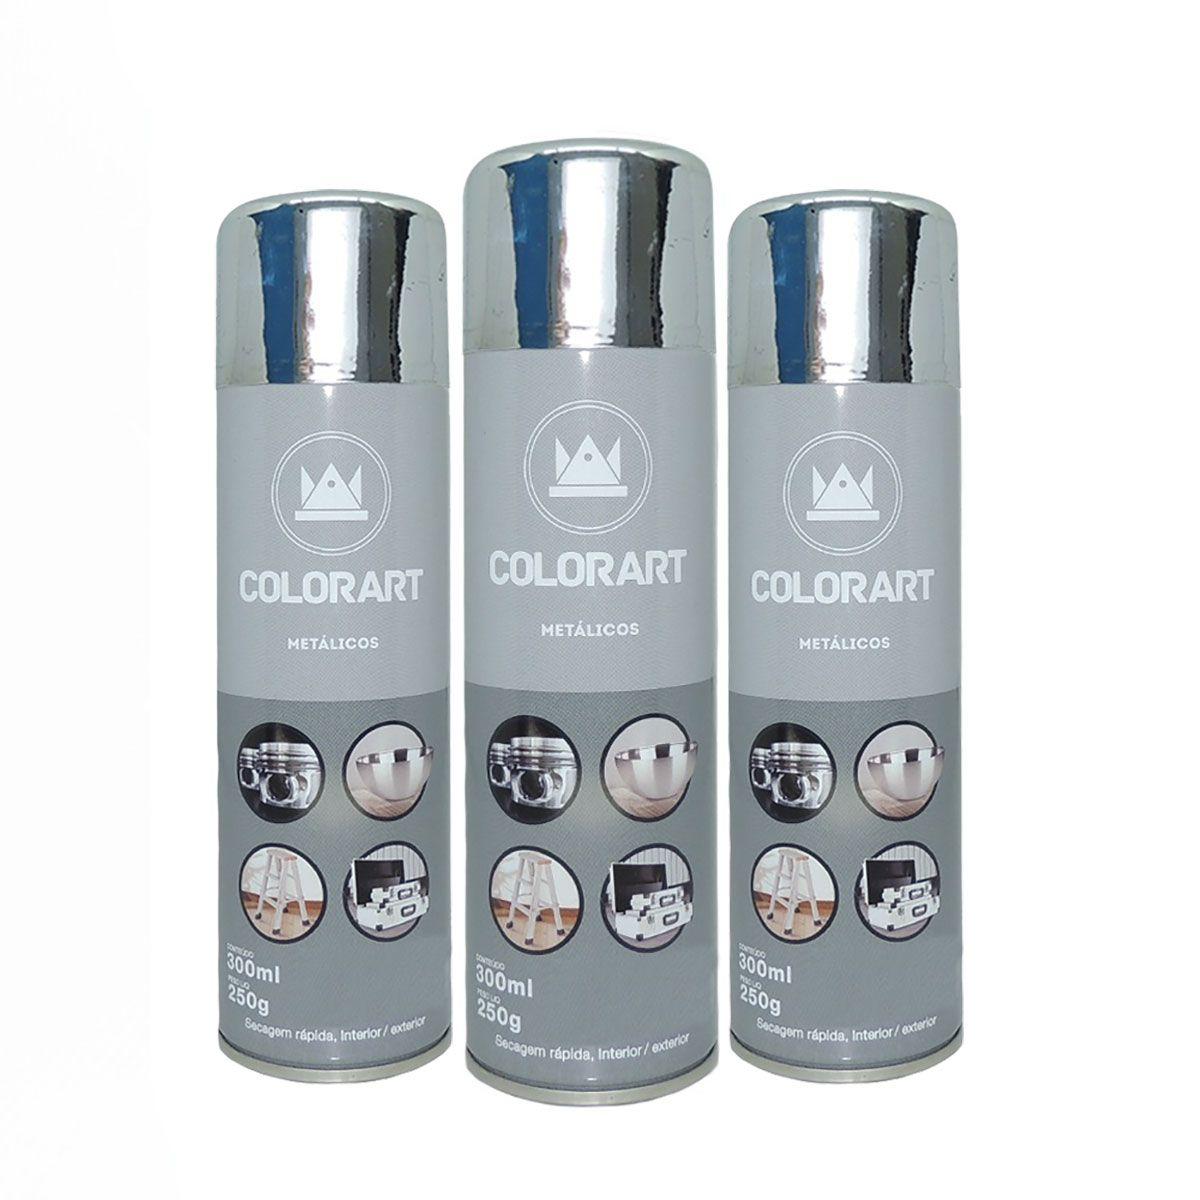 3 Tintas Spray Cores Metálicas Colorart Cromado